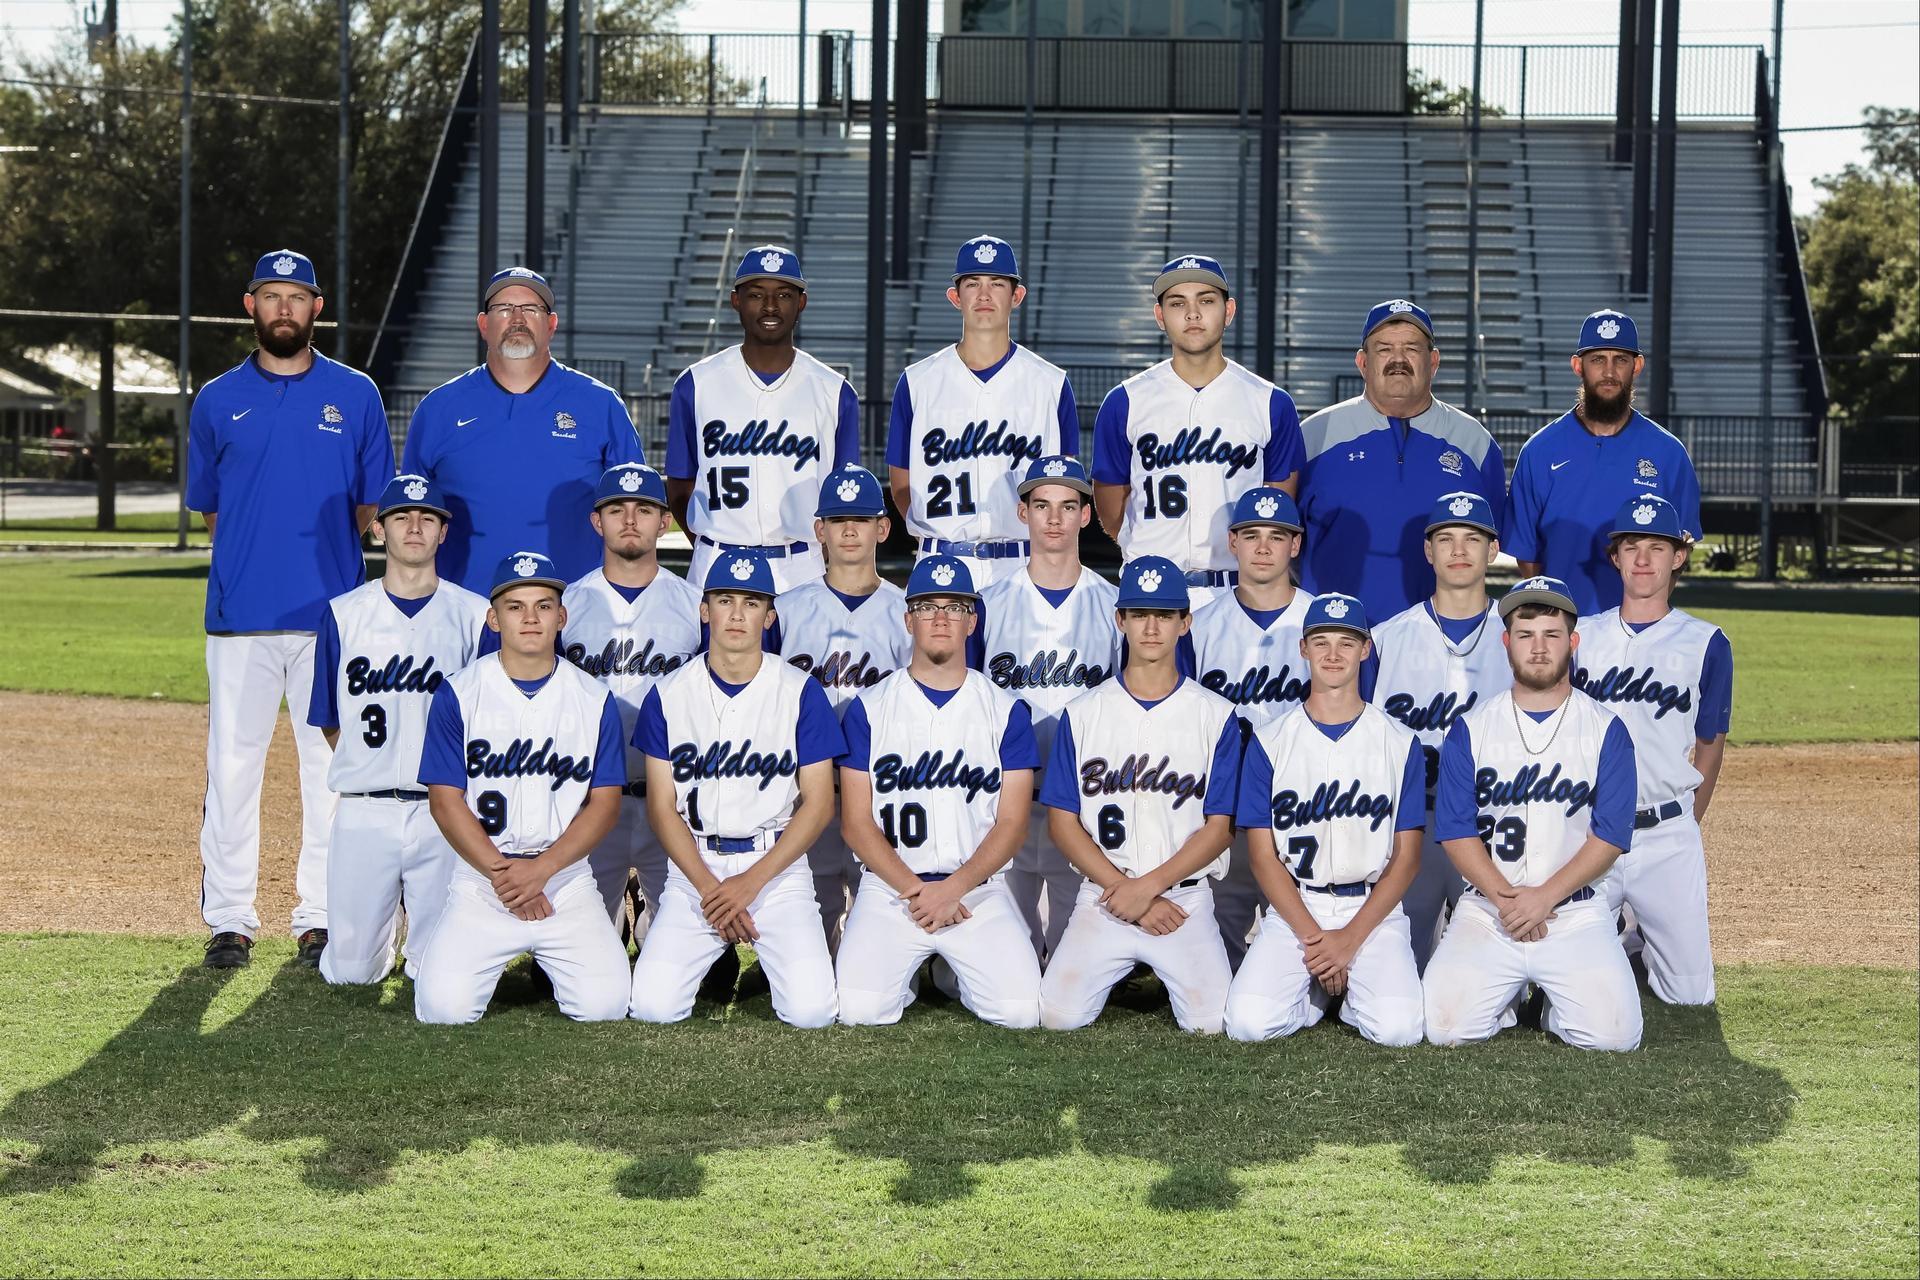 DHS baseball team